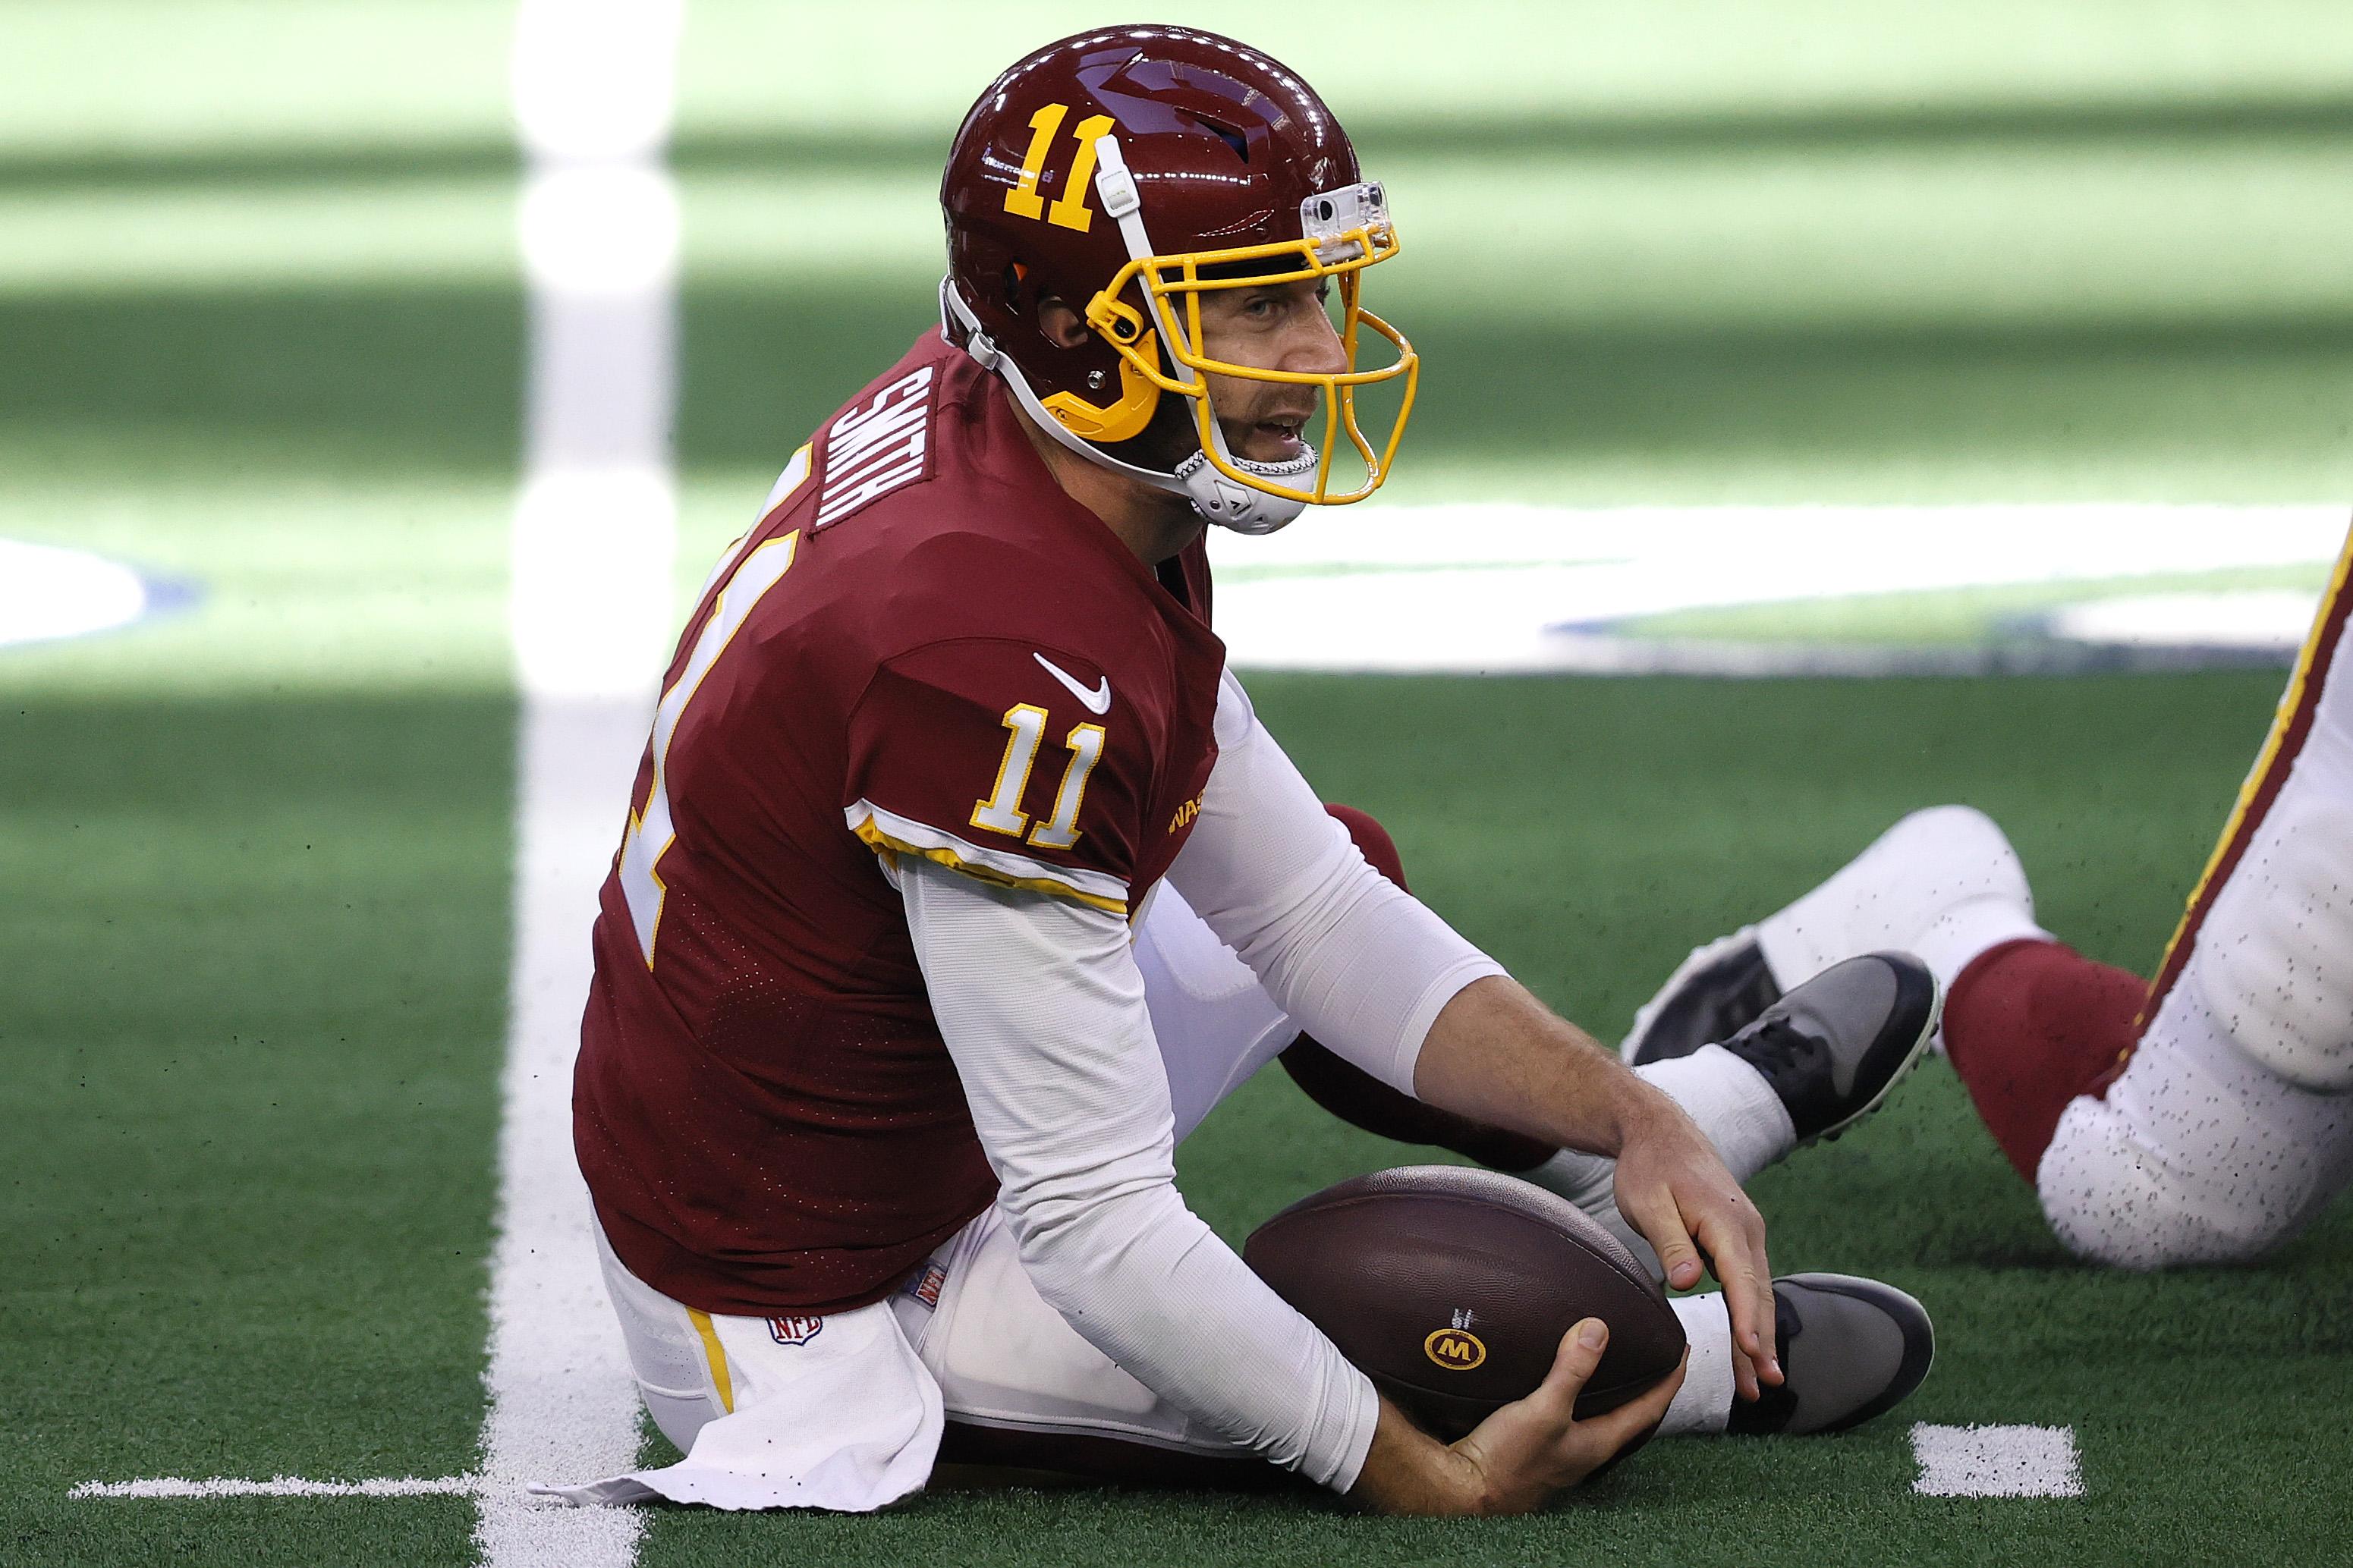 Alex Smith of the Washington Football Team sits on the field